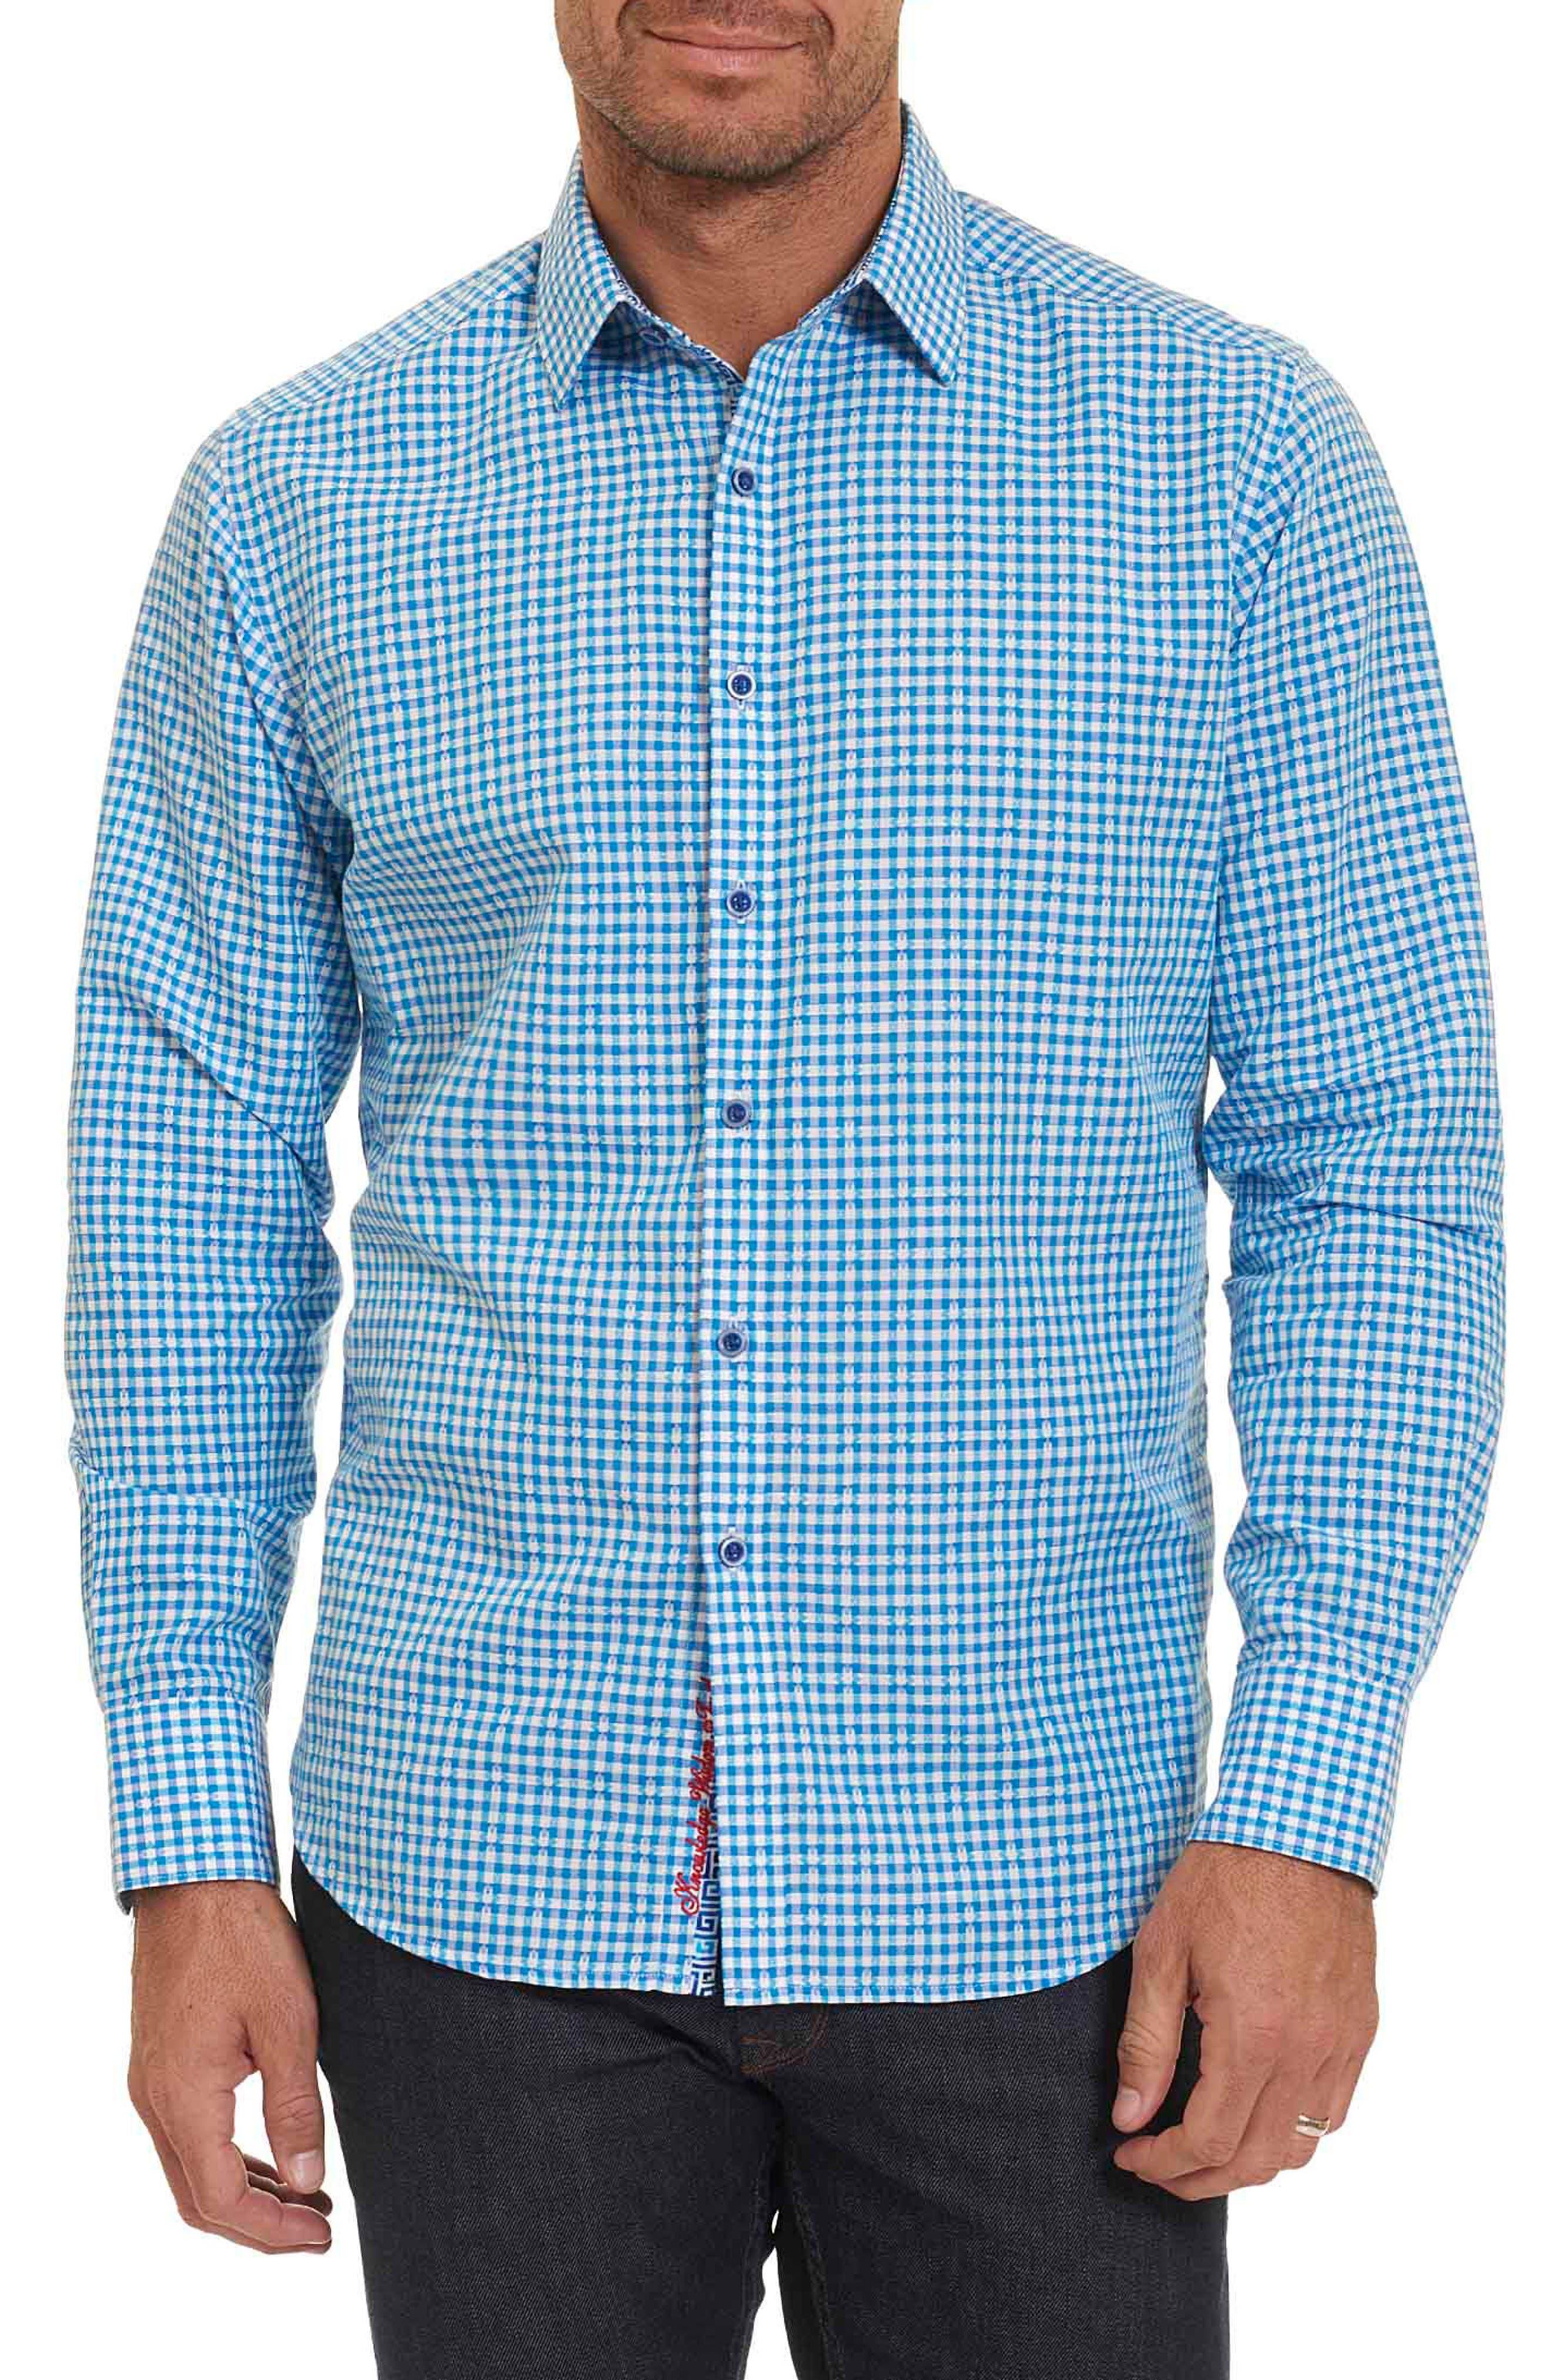 Alternate Image 1 Selected - Robert Graham La Monica Classic Fit Gingham Linen & Cotton Sport Shirt